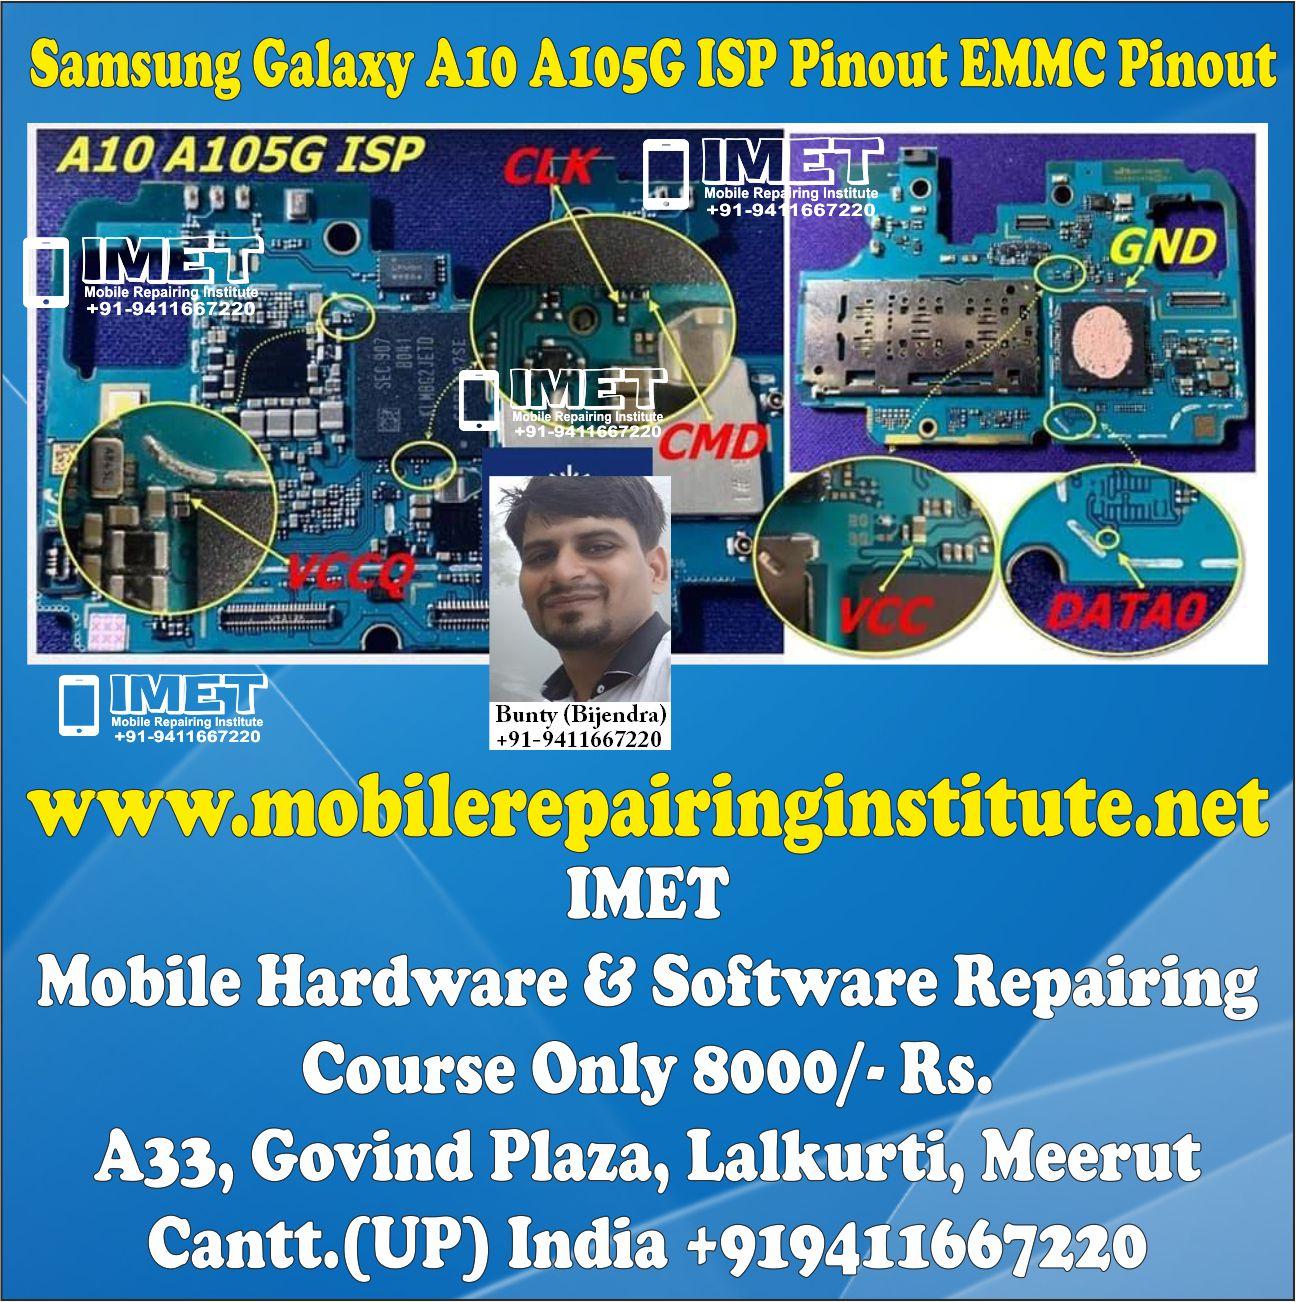 Samsung Galaxy A10 A105G ISP Pinout EMMC Pinout – Dead Boot Repair FRP Remove